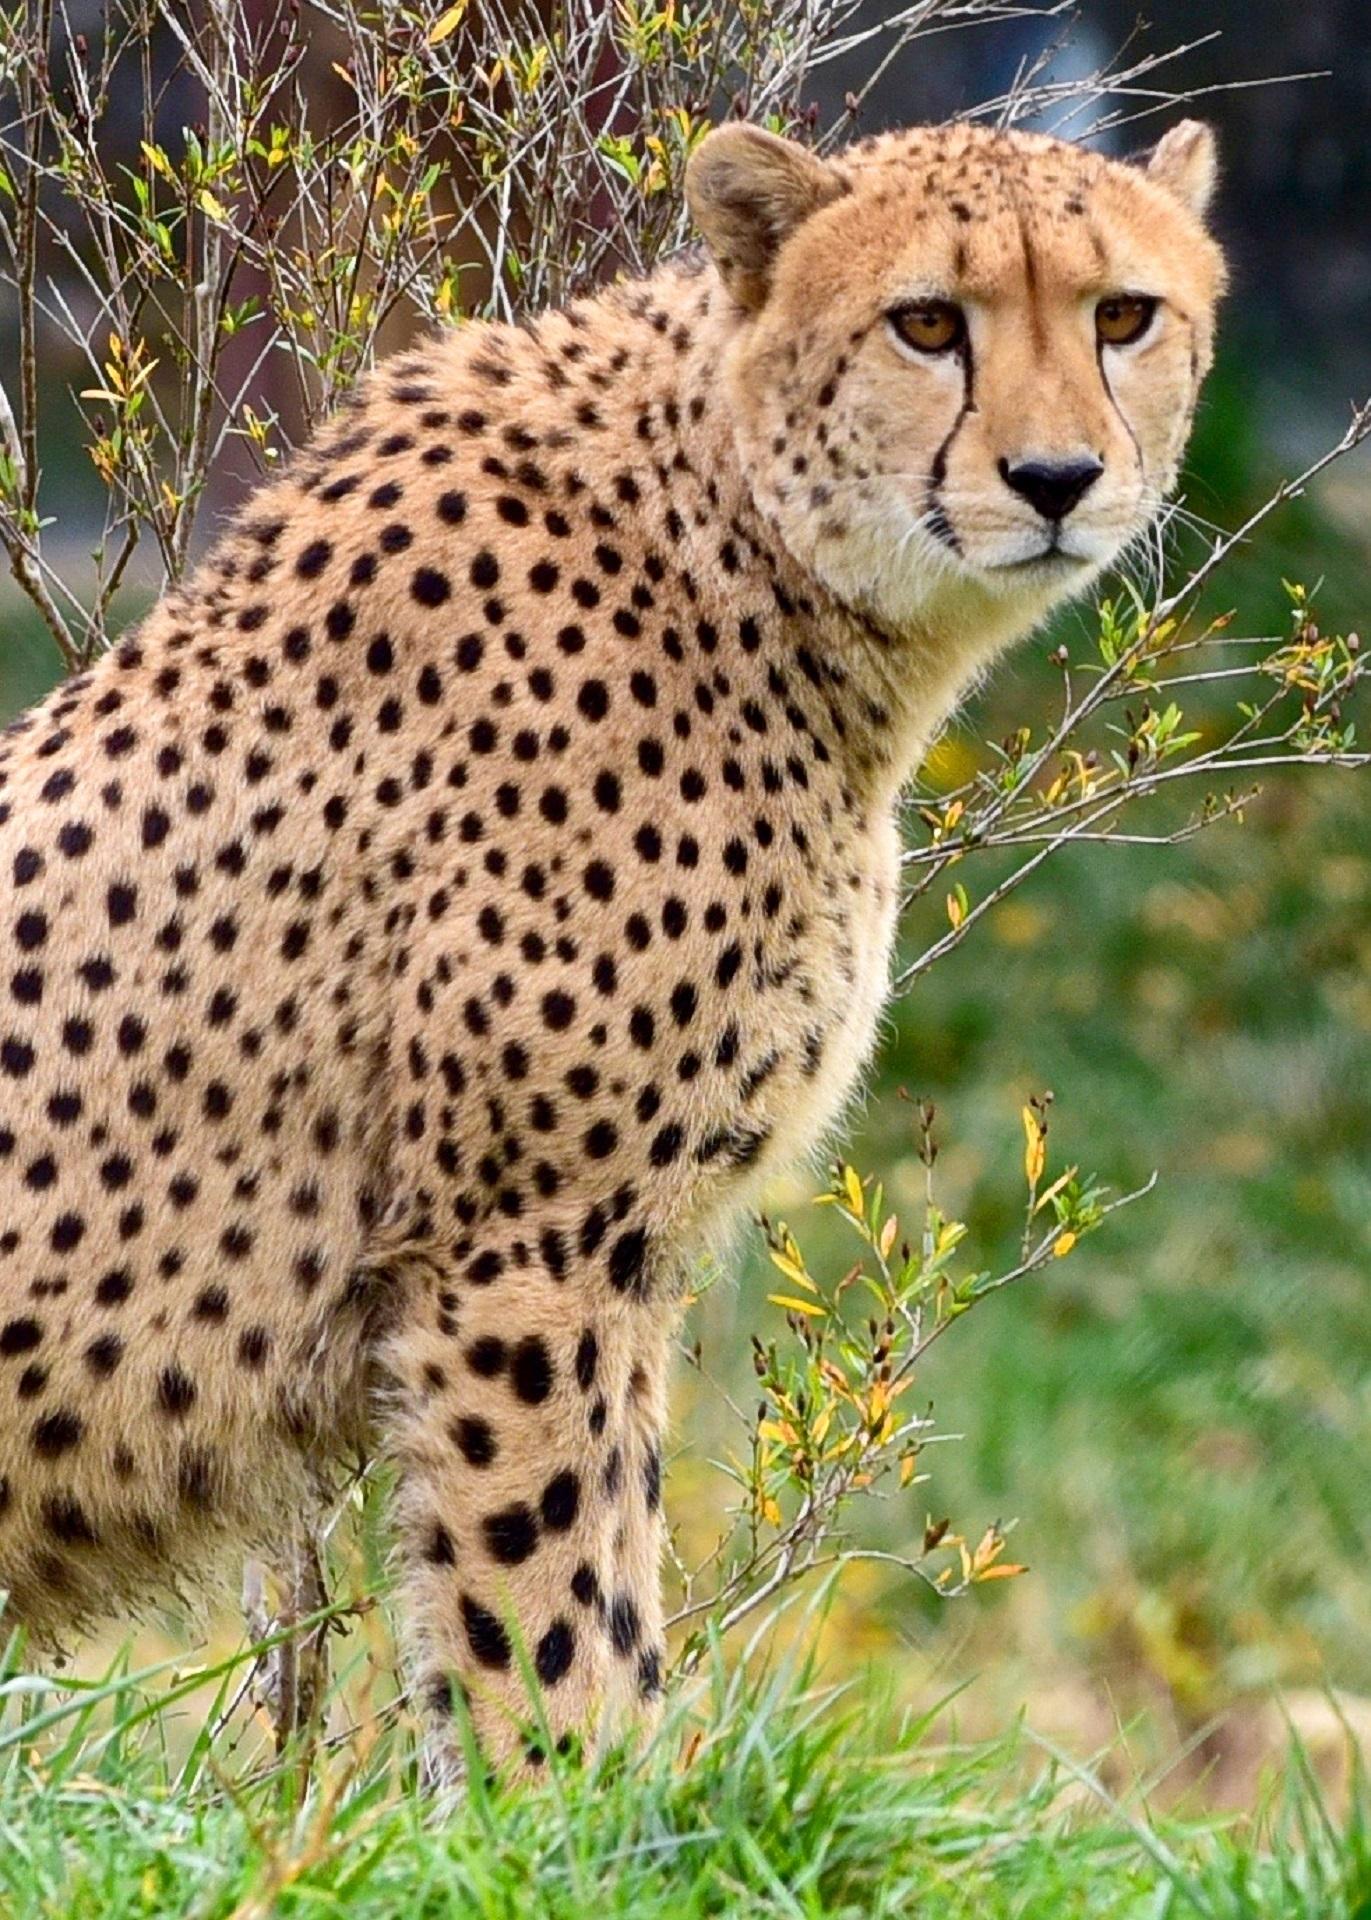 Cheetah Cat Pictures